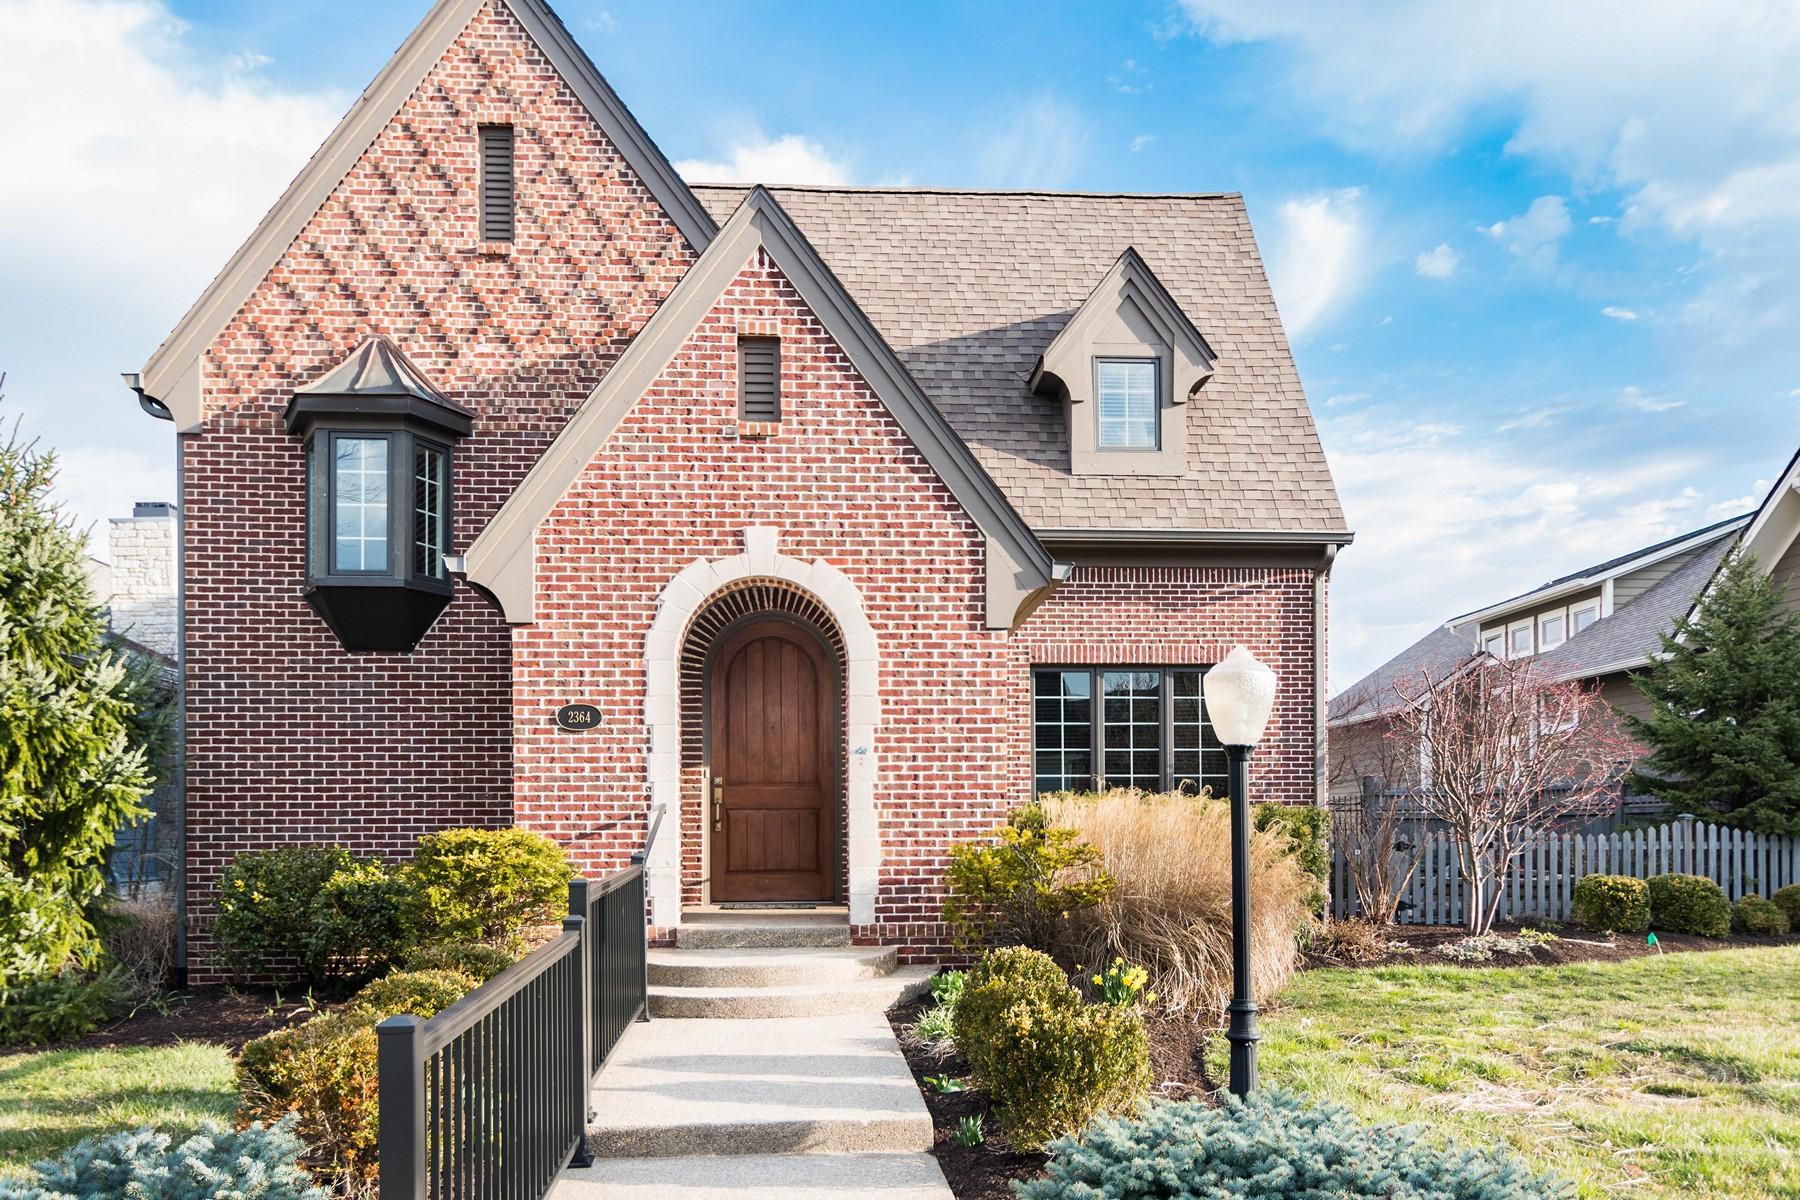 Single Family Home for Sale at Impeccable Brick Tudor Home 2364 Shaftesbury Road Carmel, Indiana, 46032 United States